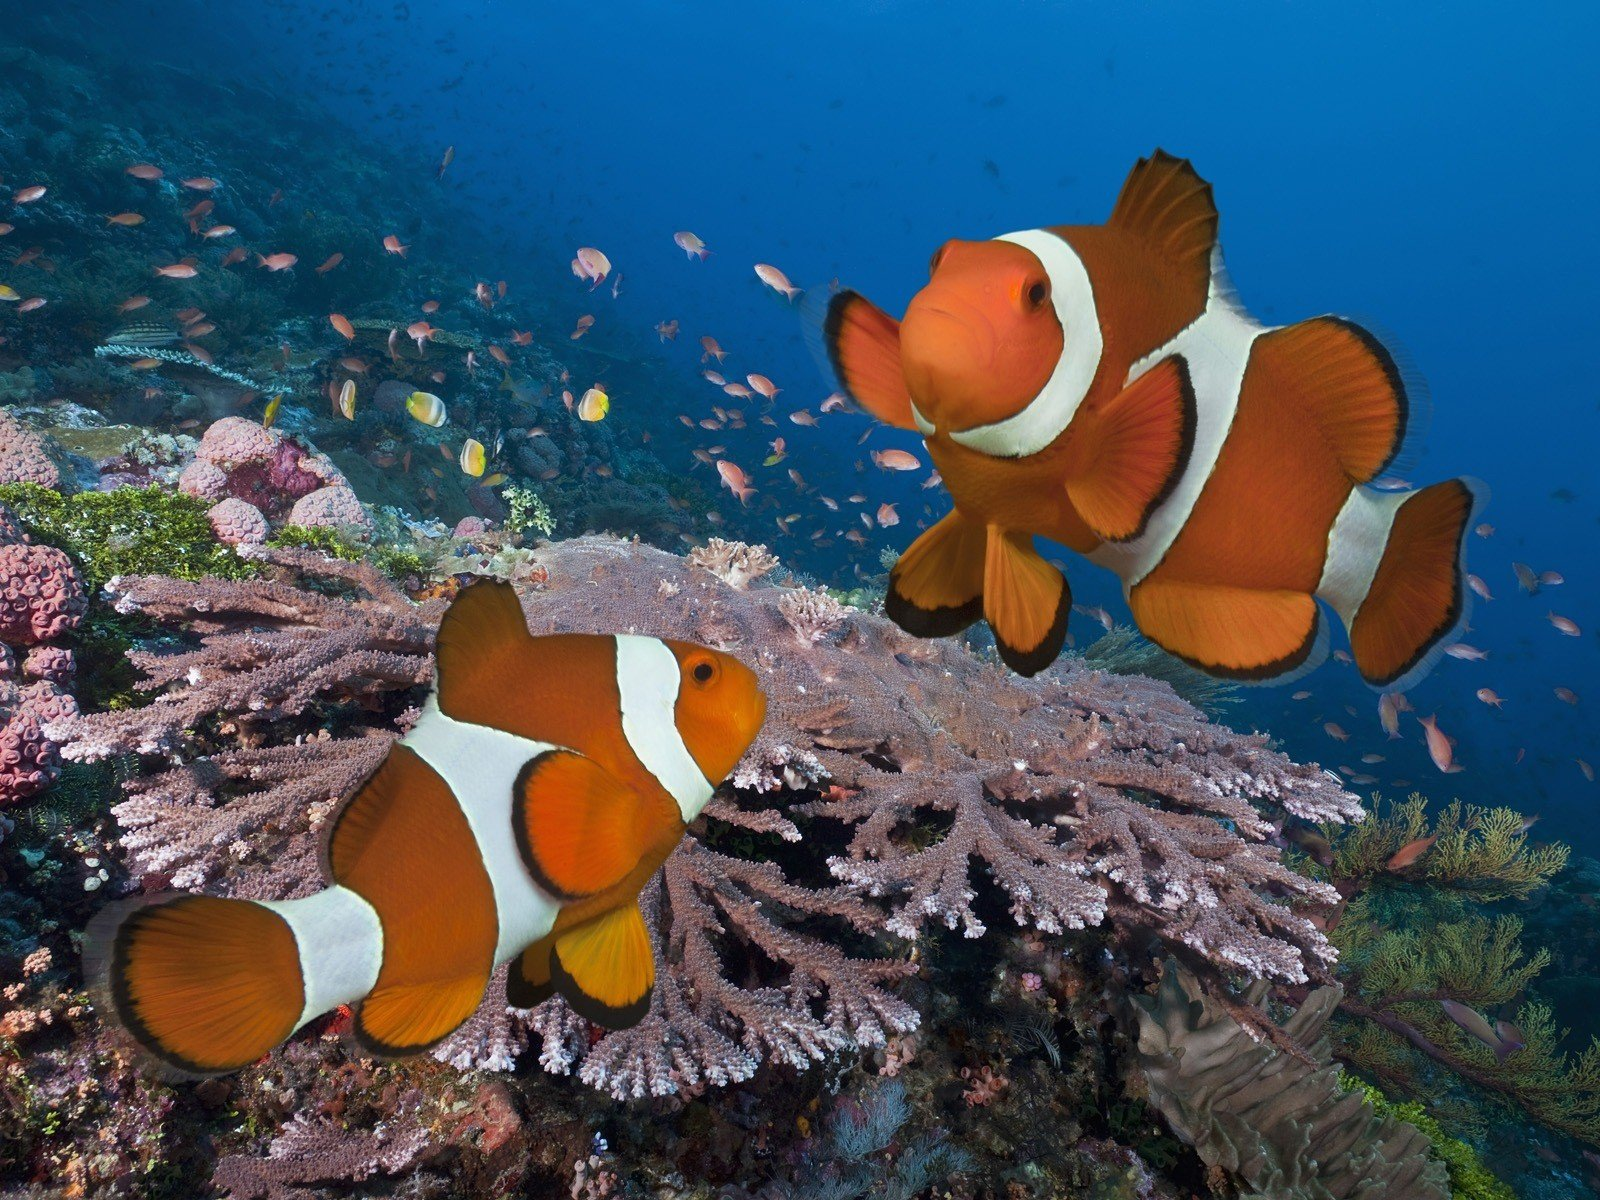 fish, Coral, Clownfish, Underwater HD Wallpapers / Desktop ...